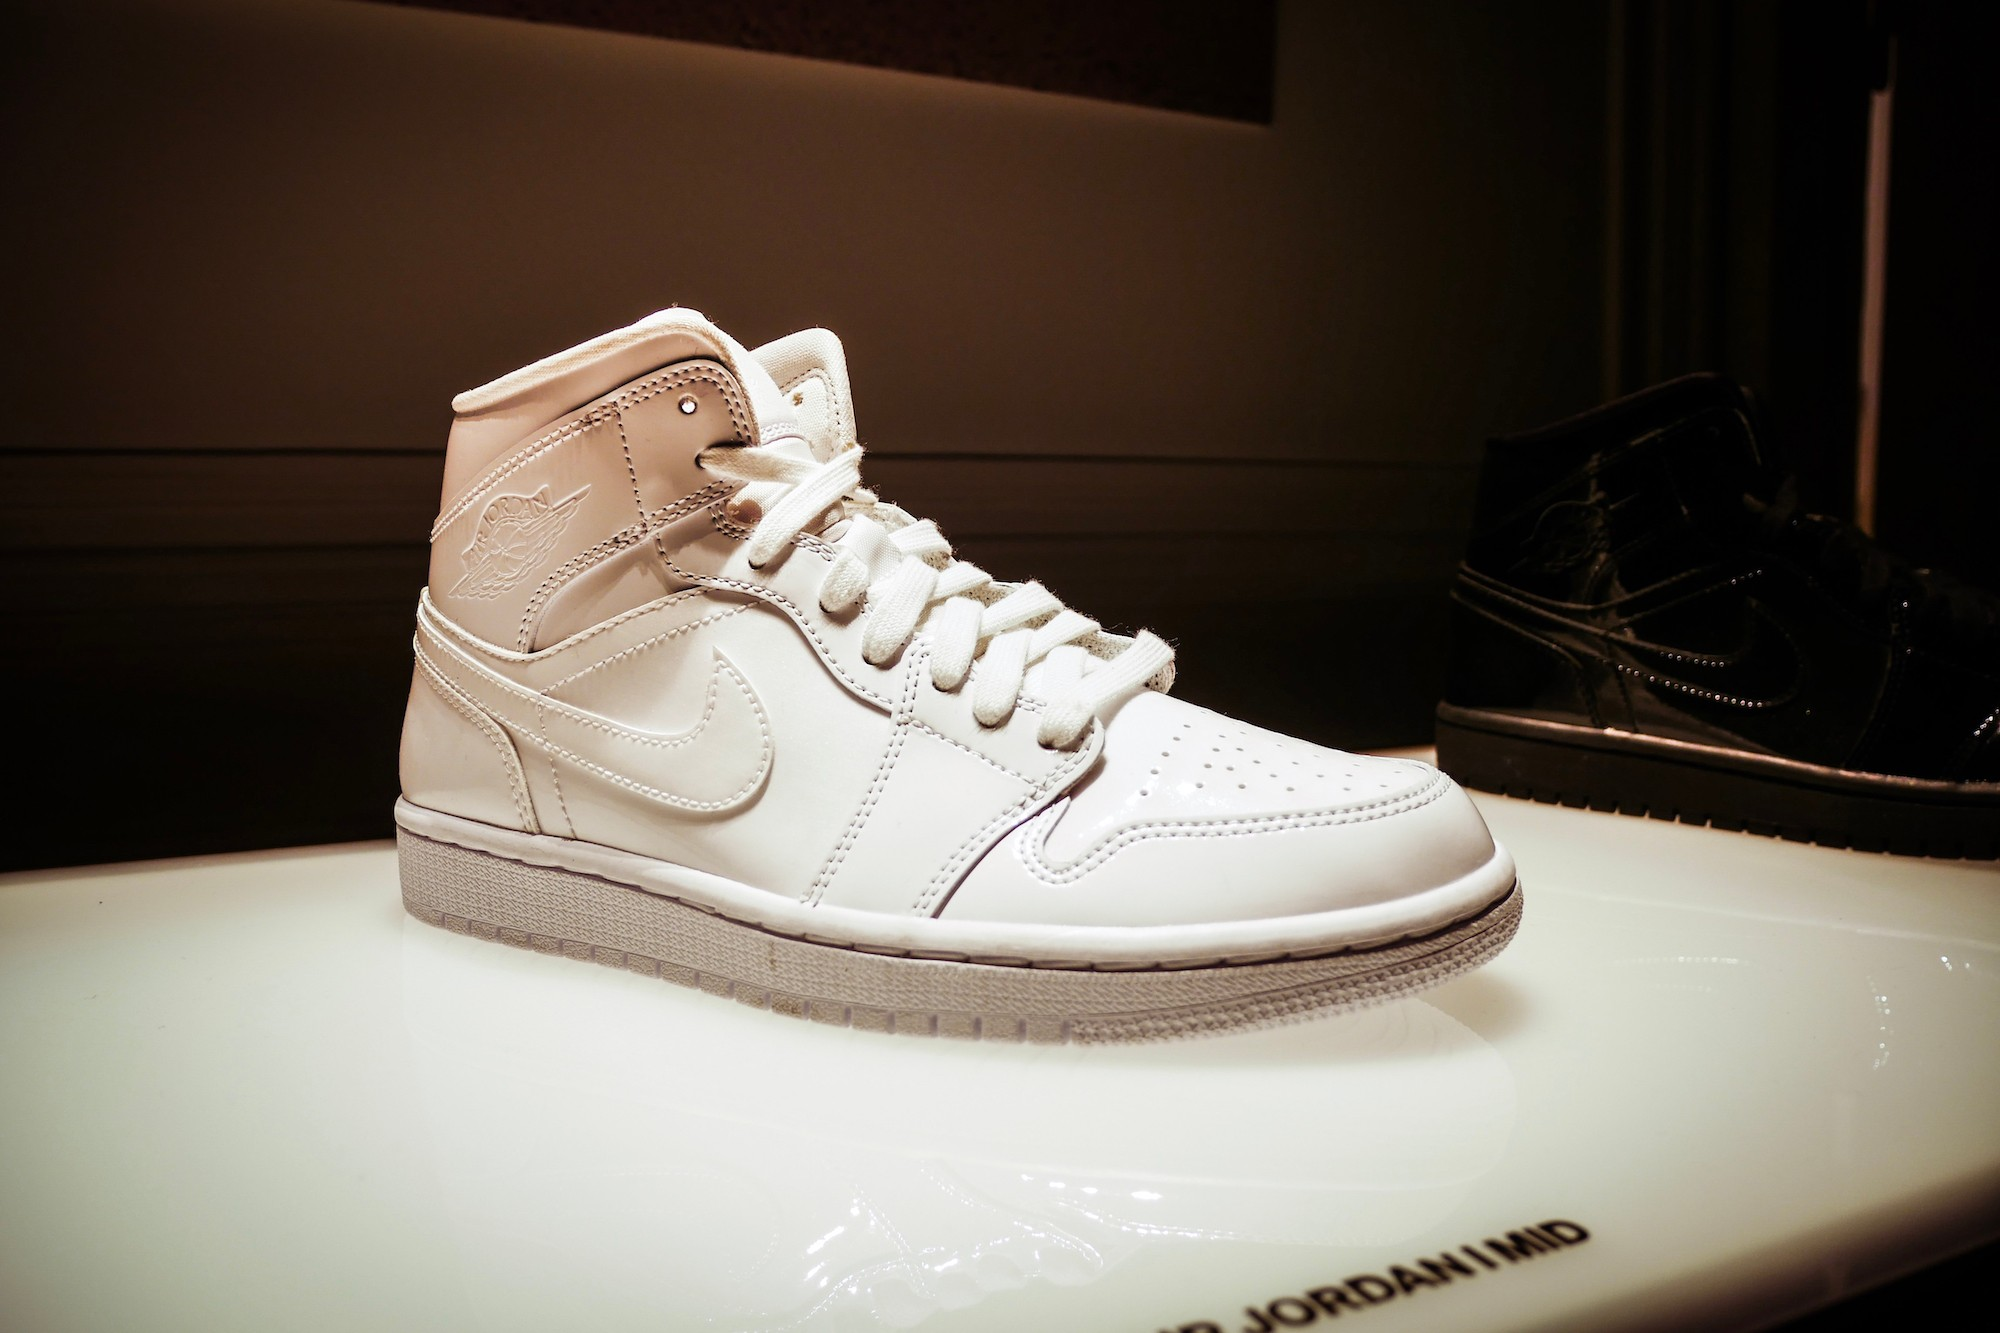 Nike Air Jordan Women's 2019 Footwear